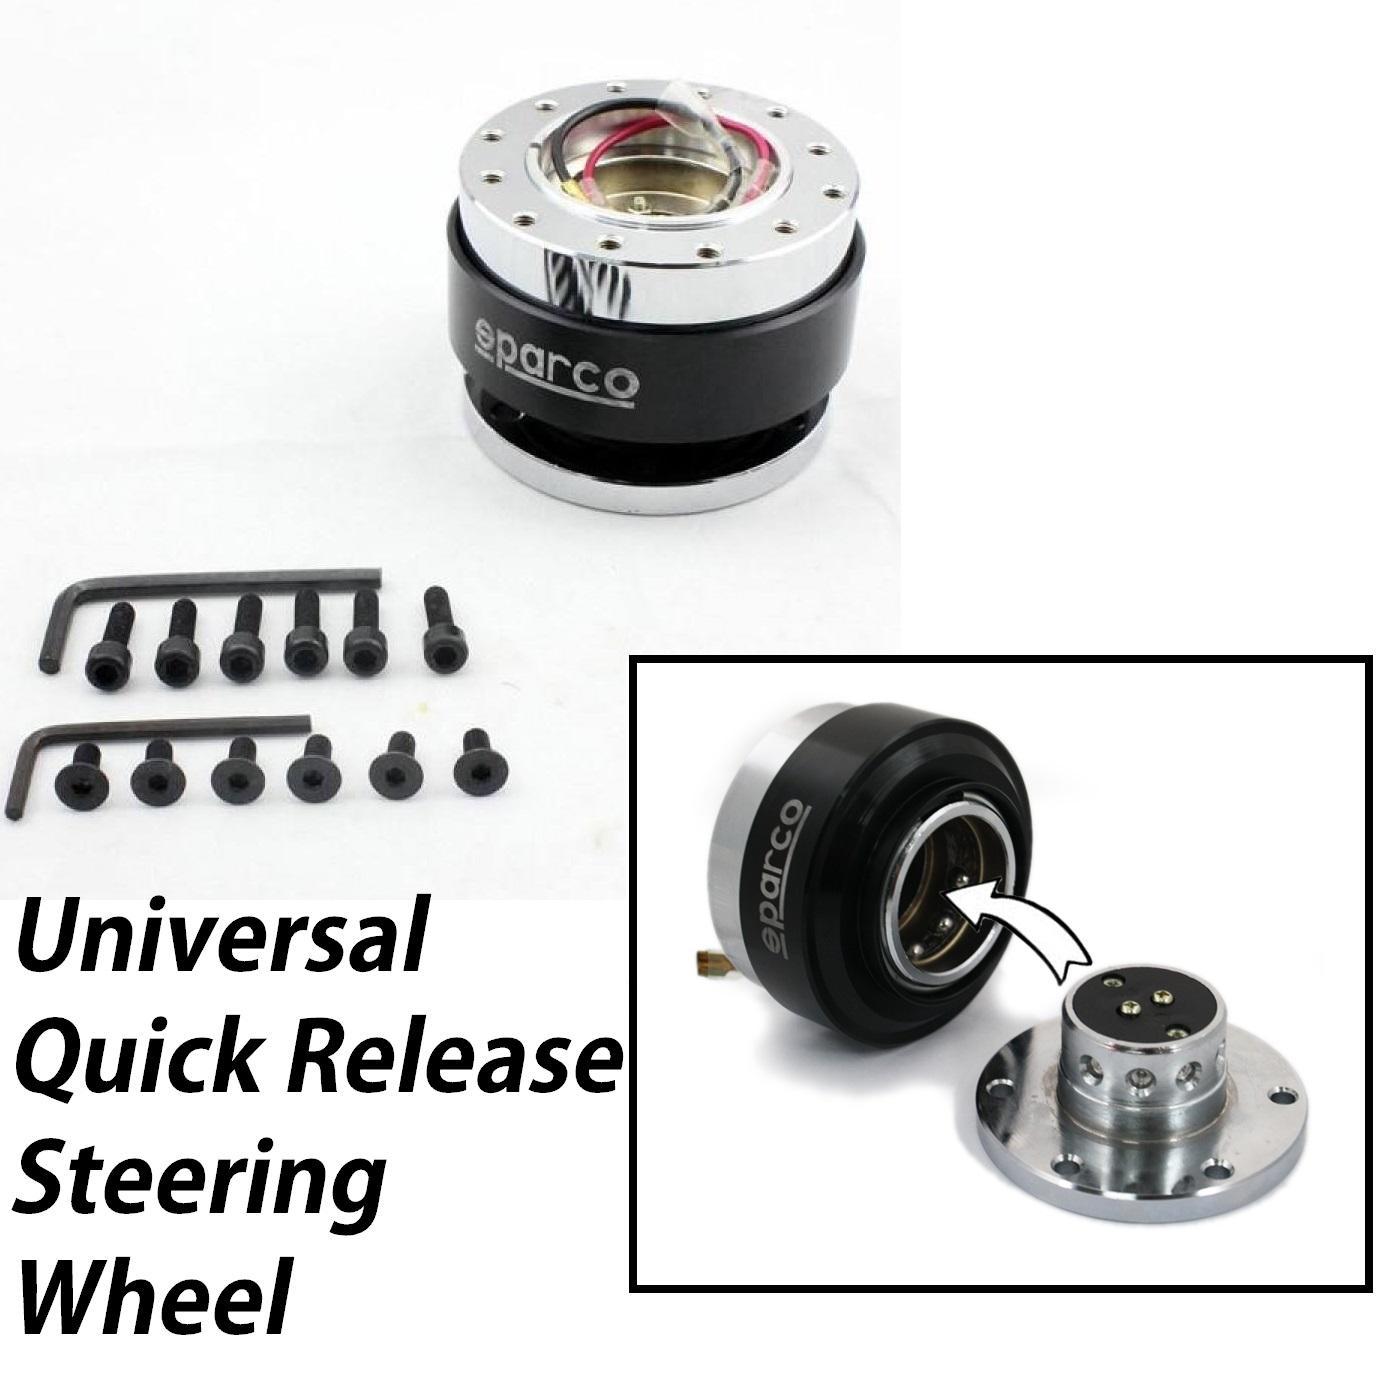 SPARCO Quick Release Boss Kit Hub Lock Joint Universal Steering Wheel Black